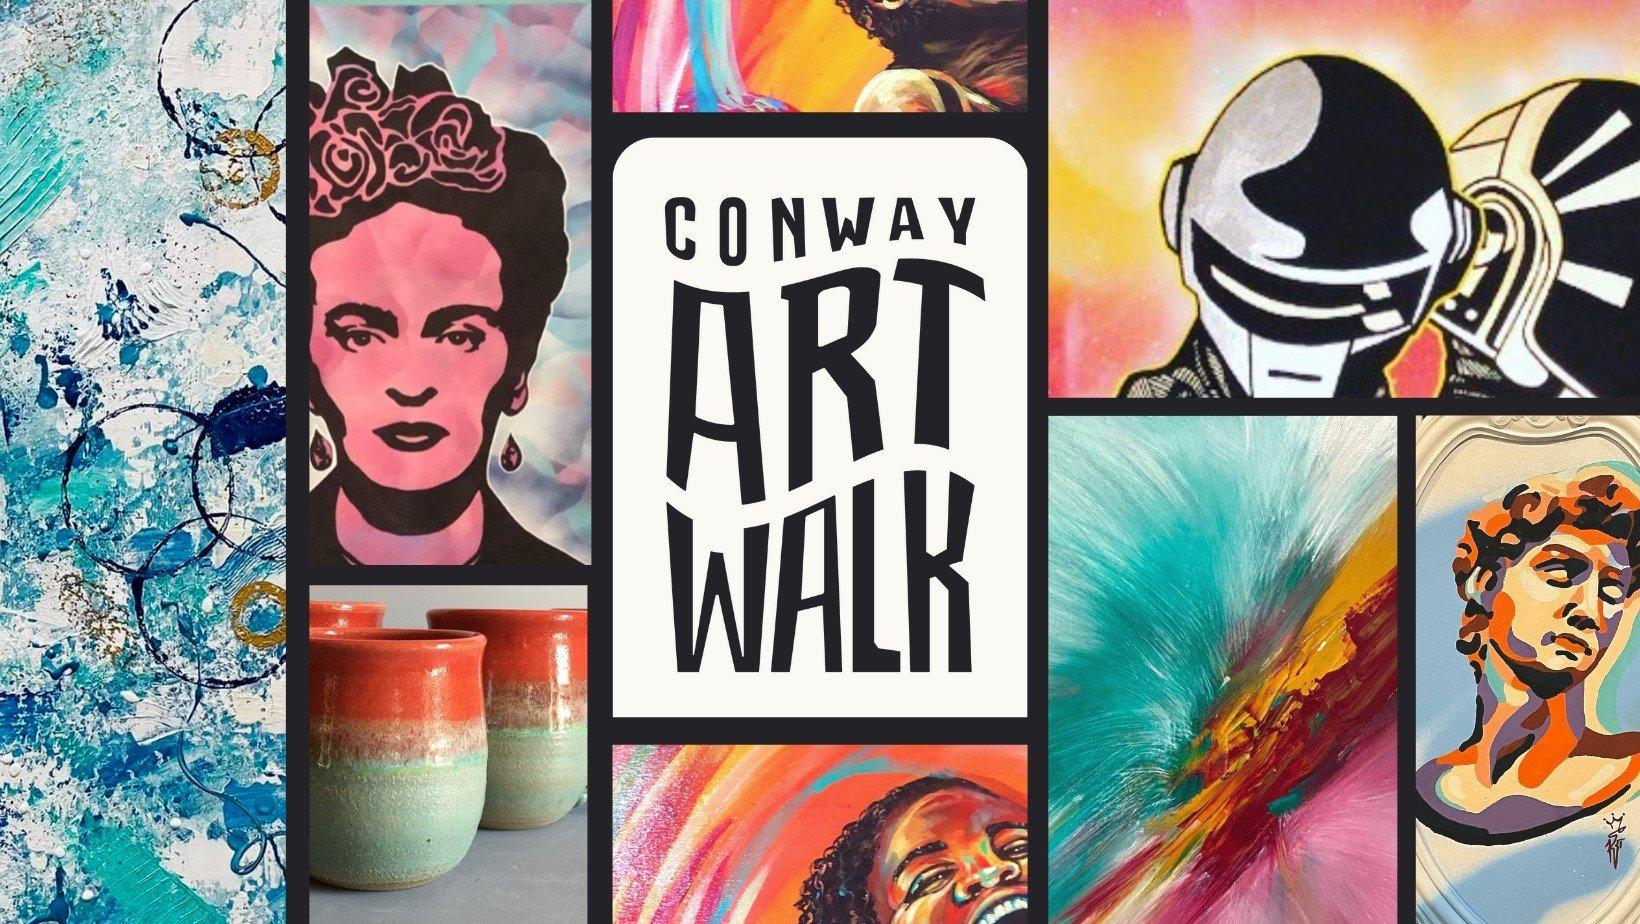 Conway Art Walk